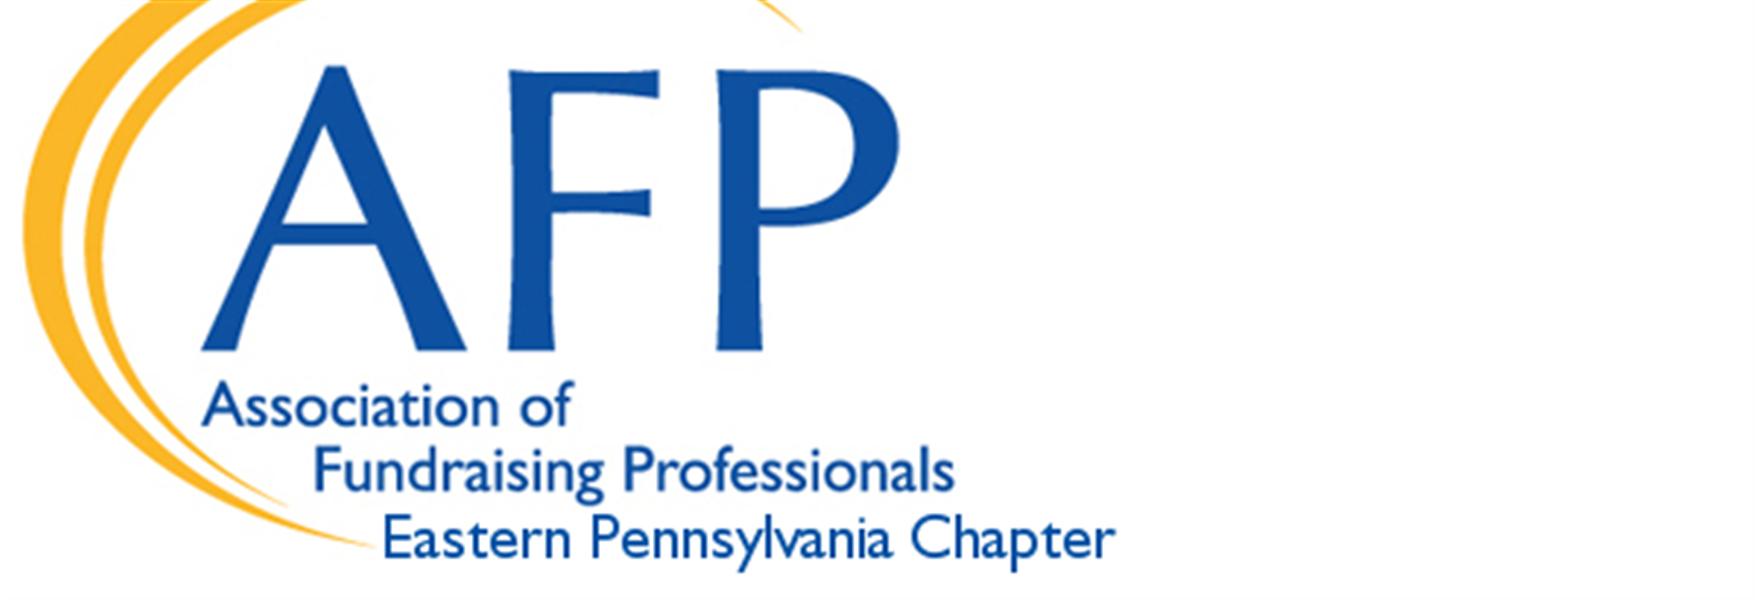 3aea59b8-7389-4483-96fb-d6689eb5163c_AFP - EPA Logo.php.png